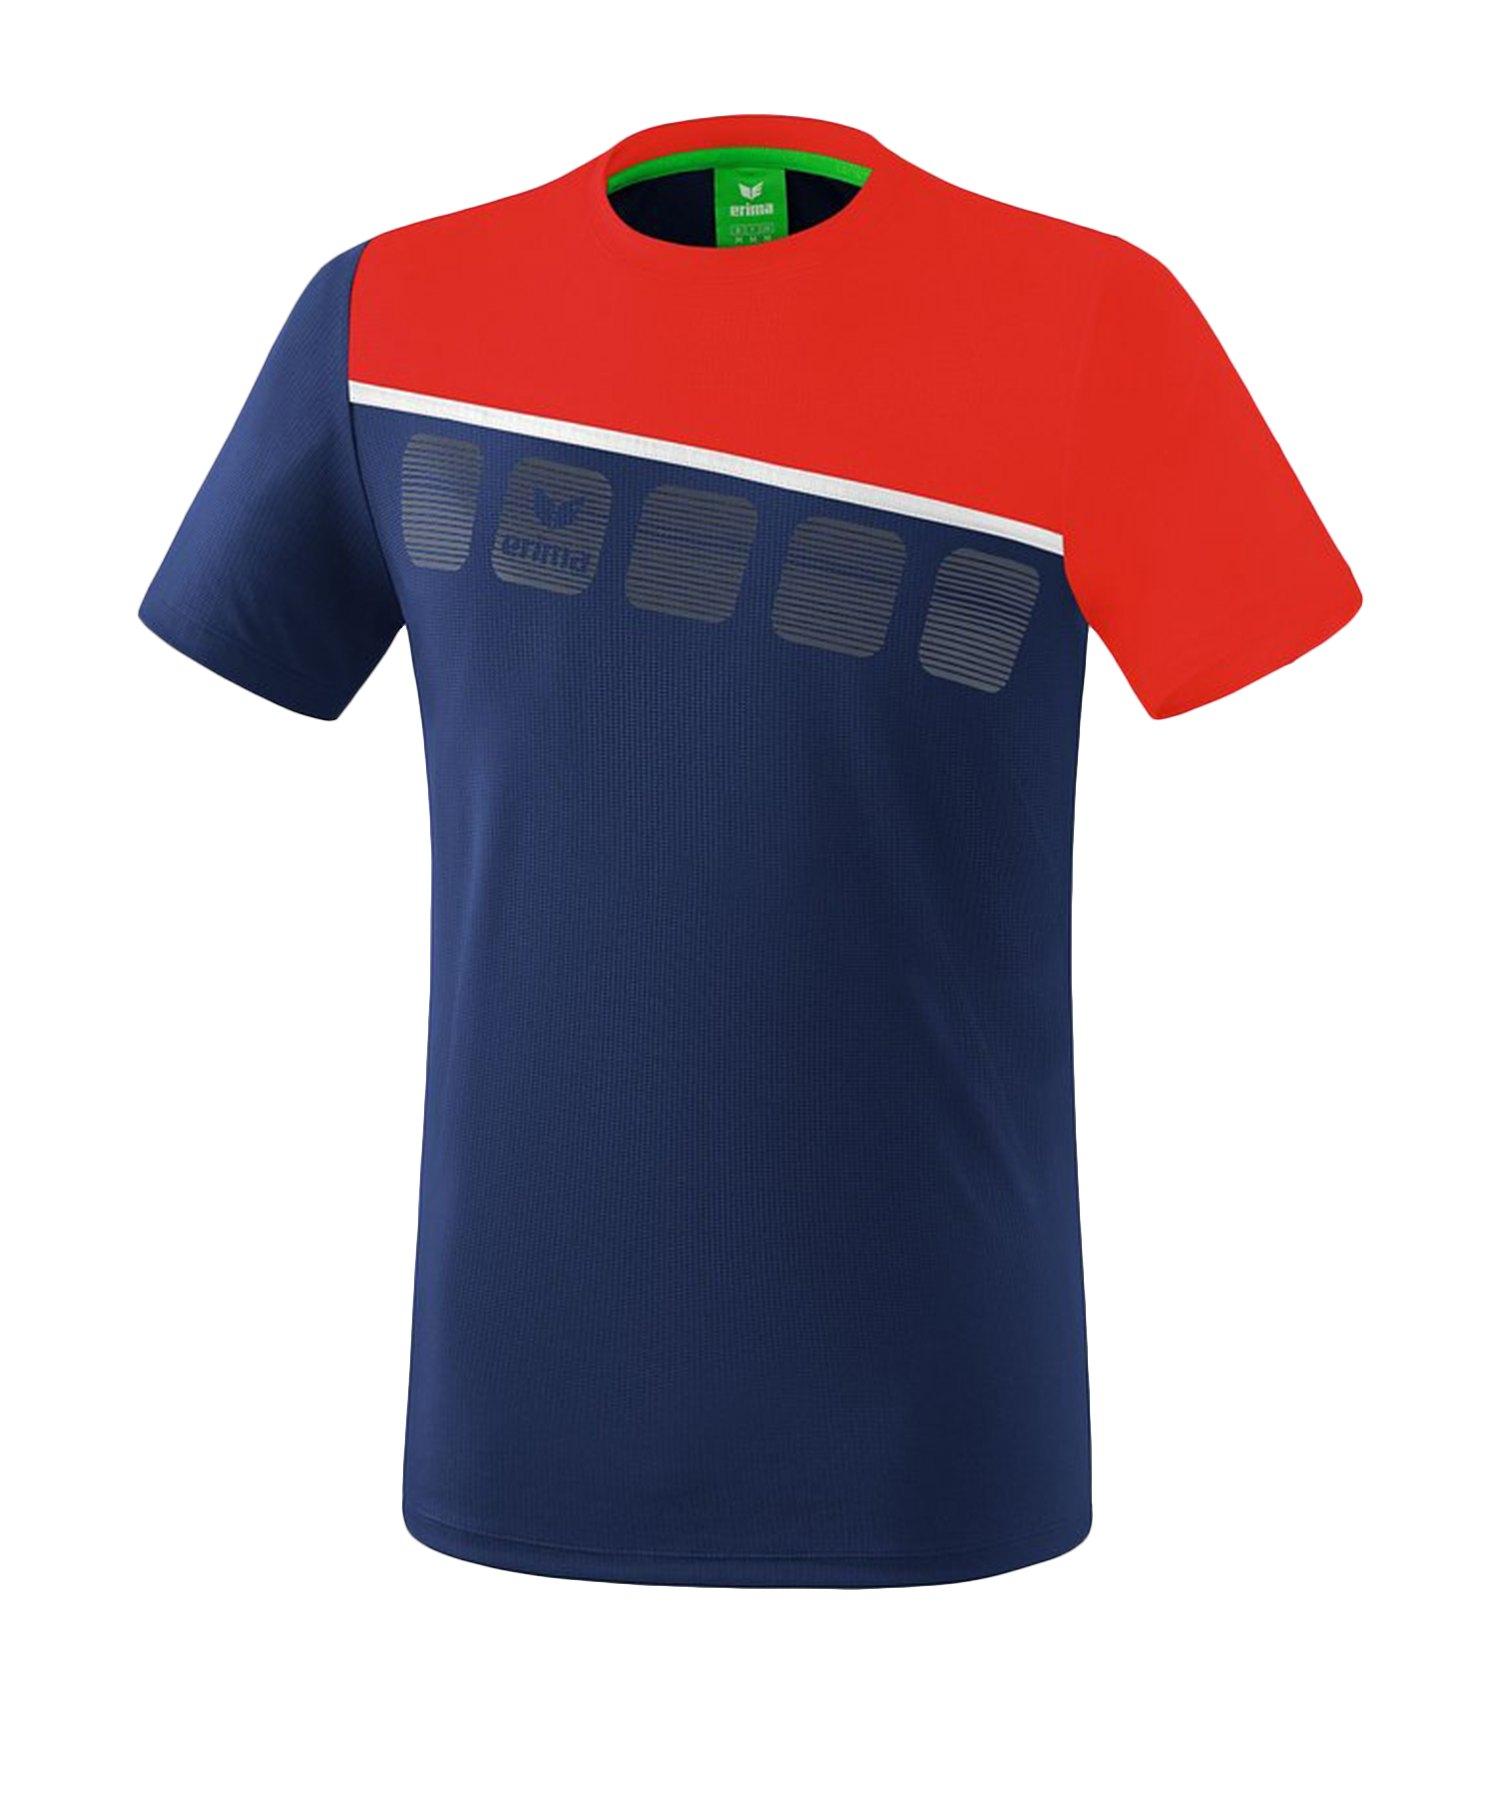 Erima 5-C T-Shirt Blau Rot - Blau